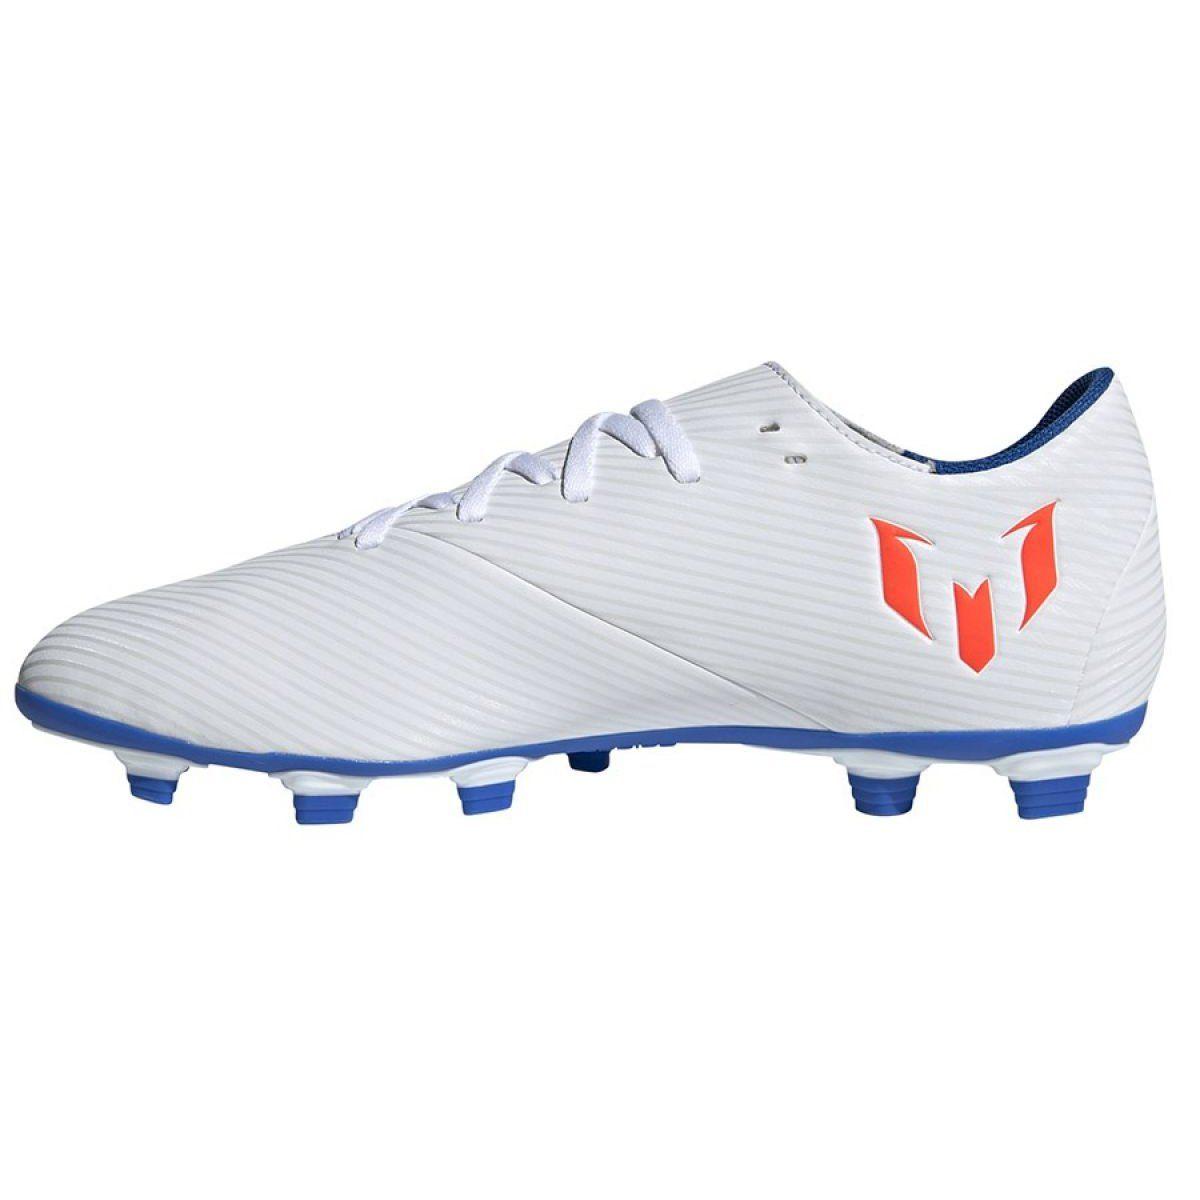 Buty Pilkarskie Adidas Nemeziz Messi 19 4 Fg M F34401 Biale Wielokolorowe Mens Football Boots Football Boots Austin Shoes